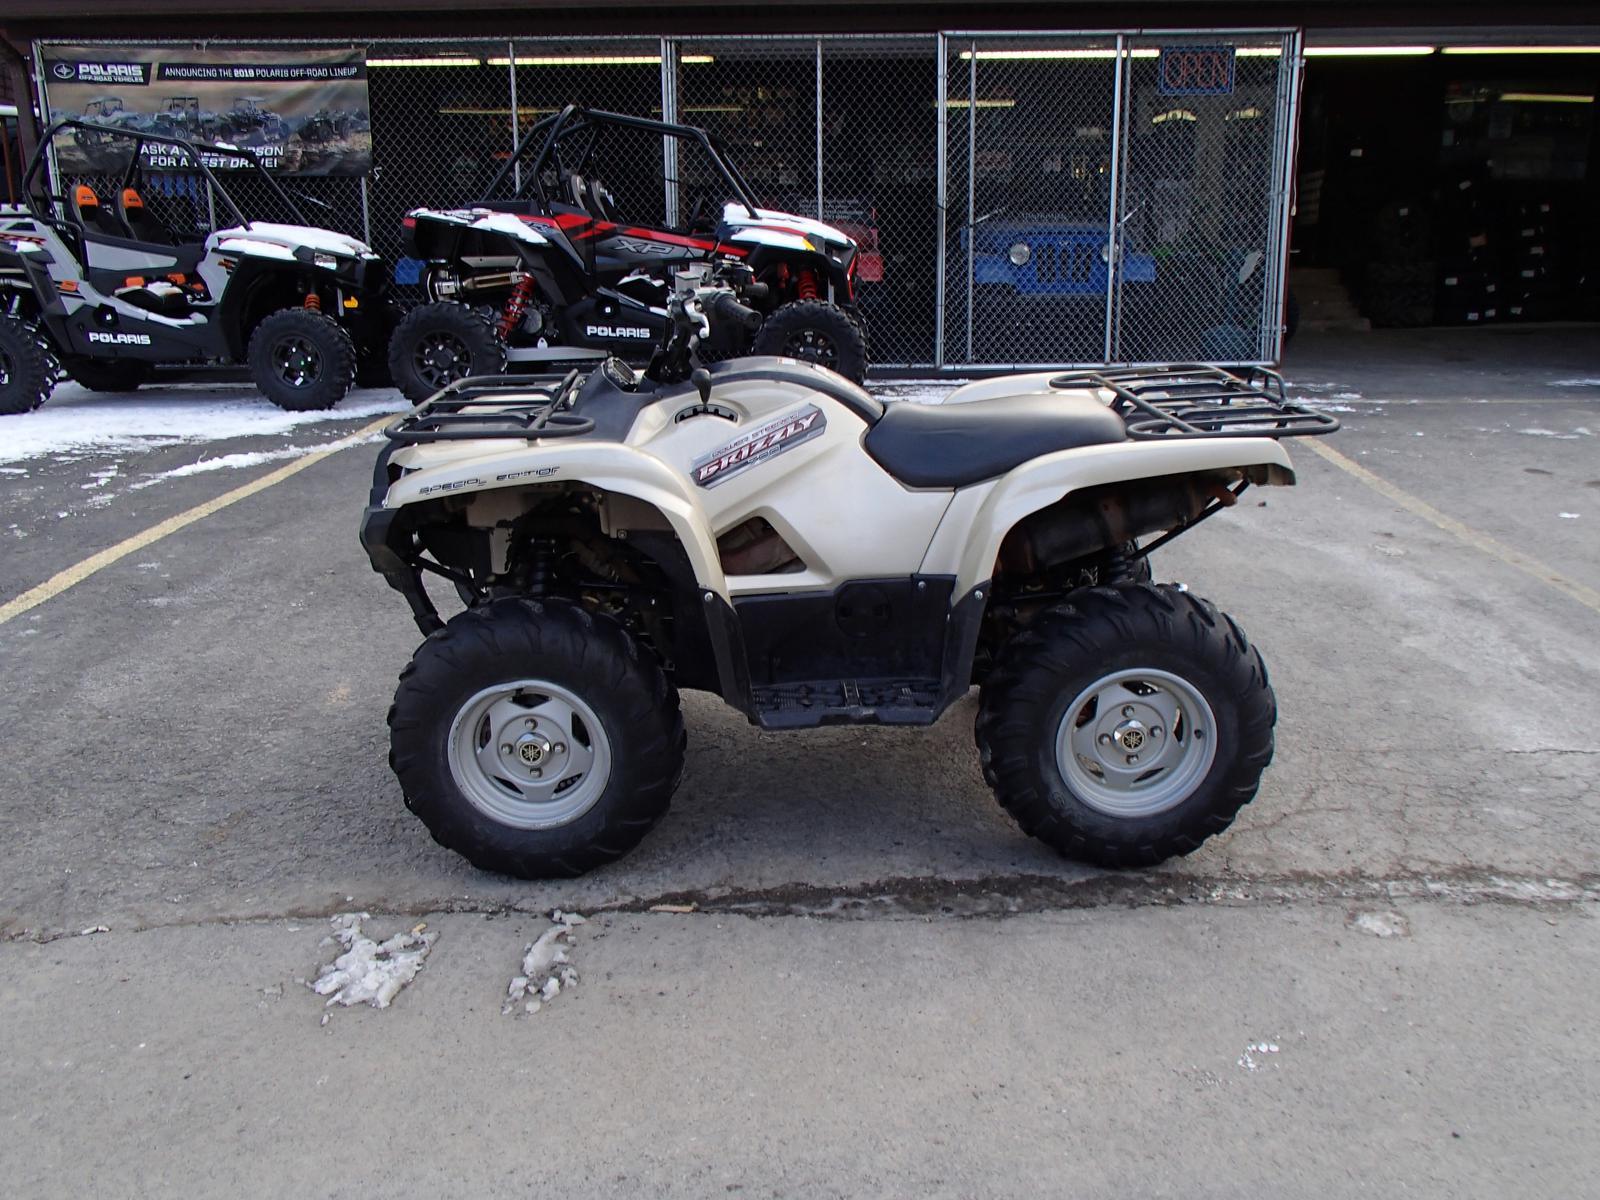 hight resolution of 2012 yamaha grizzly 700 eps for sale in elkins wv elkins motorsports 304 636 7732